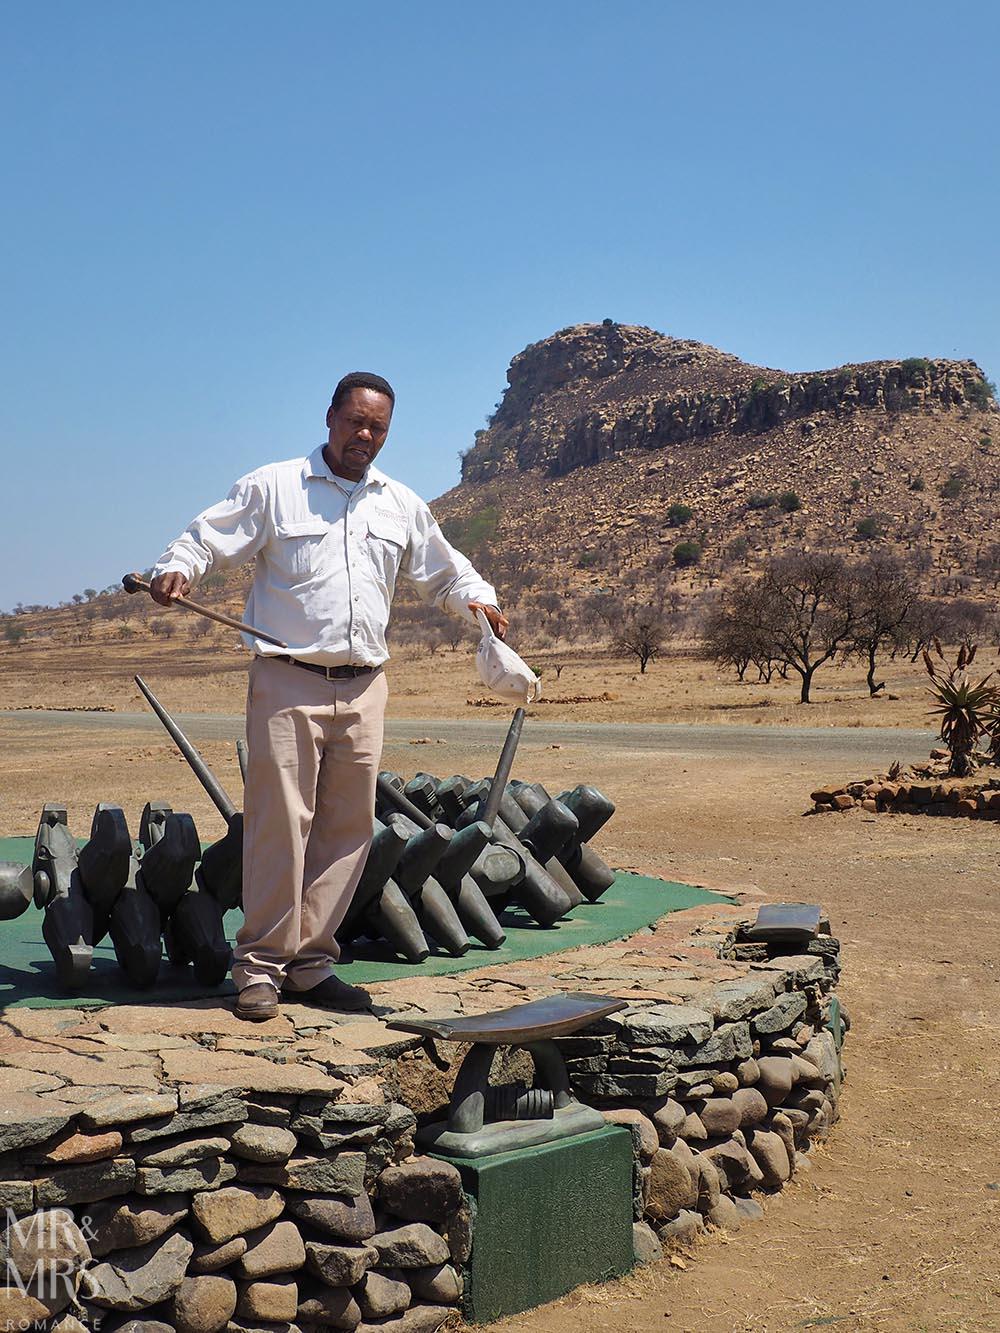 South Africa Tourism - Isandlwana battle site